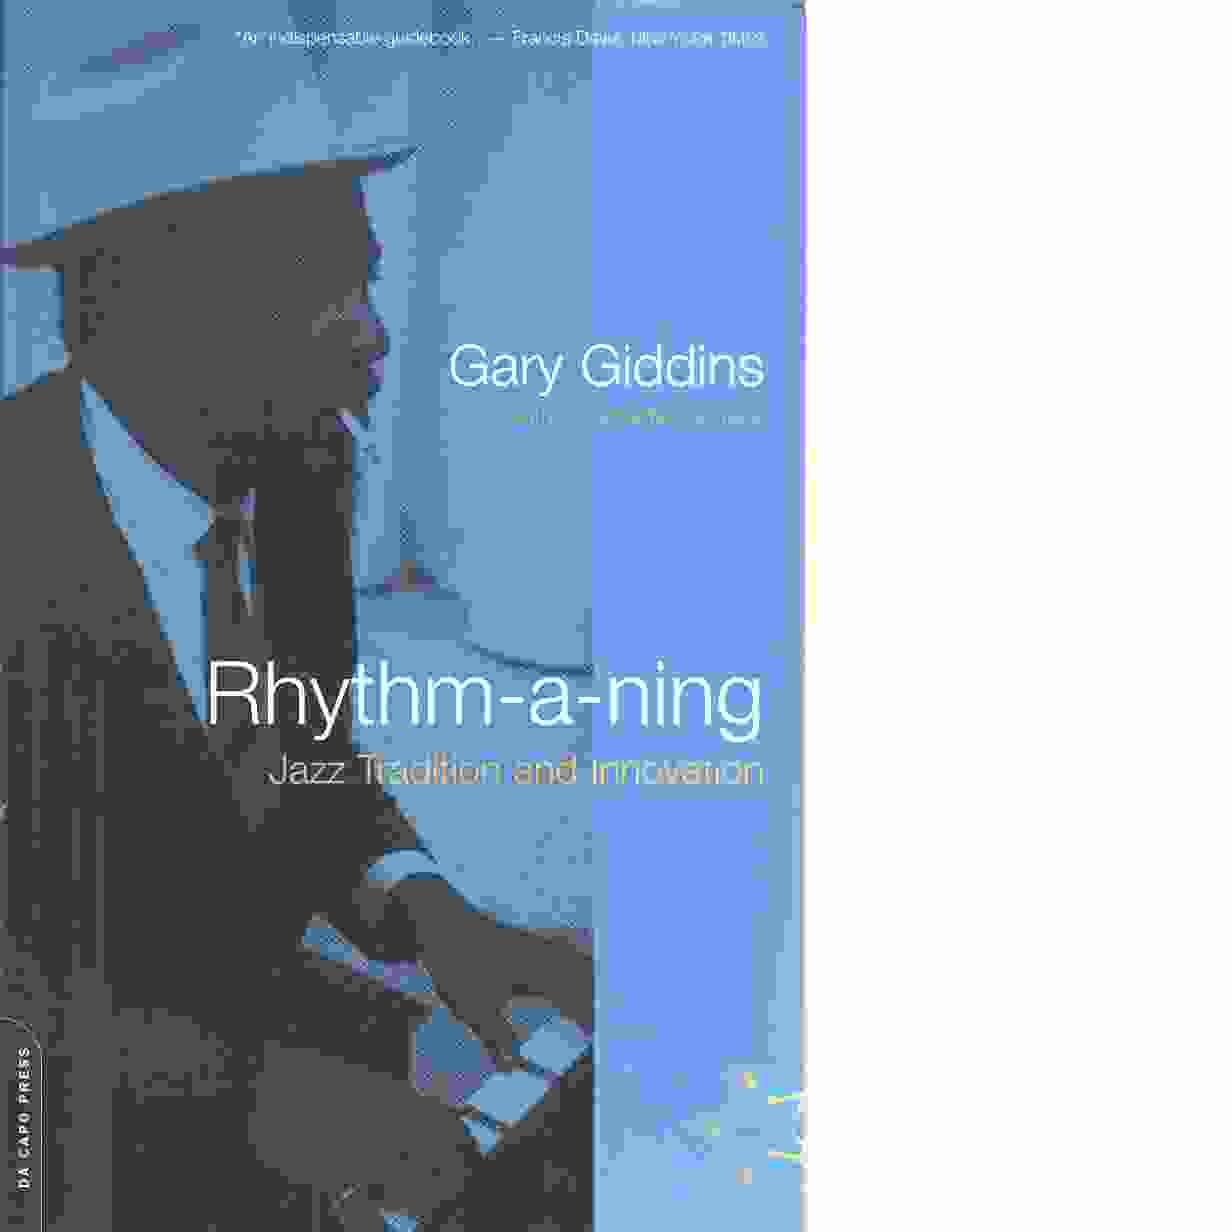 Rhythm-a-ning -  Giddins, Gary